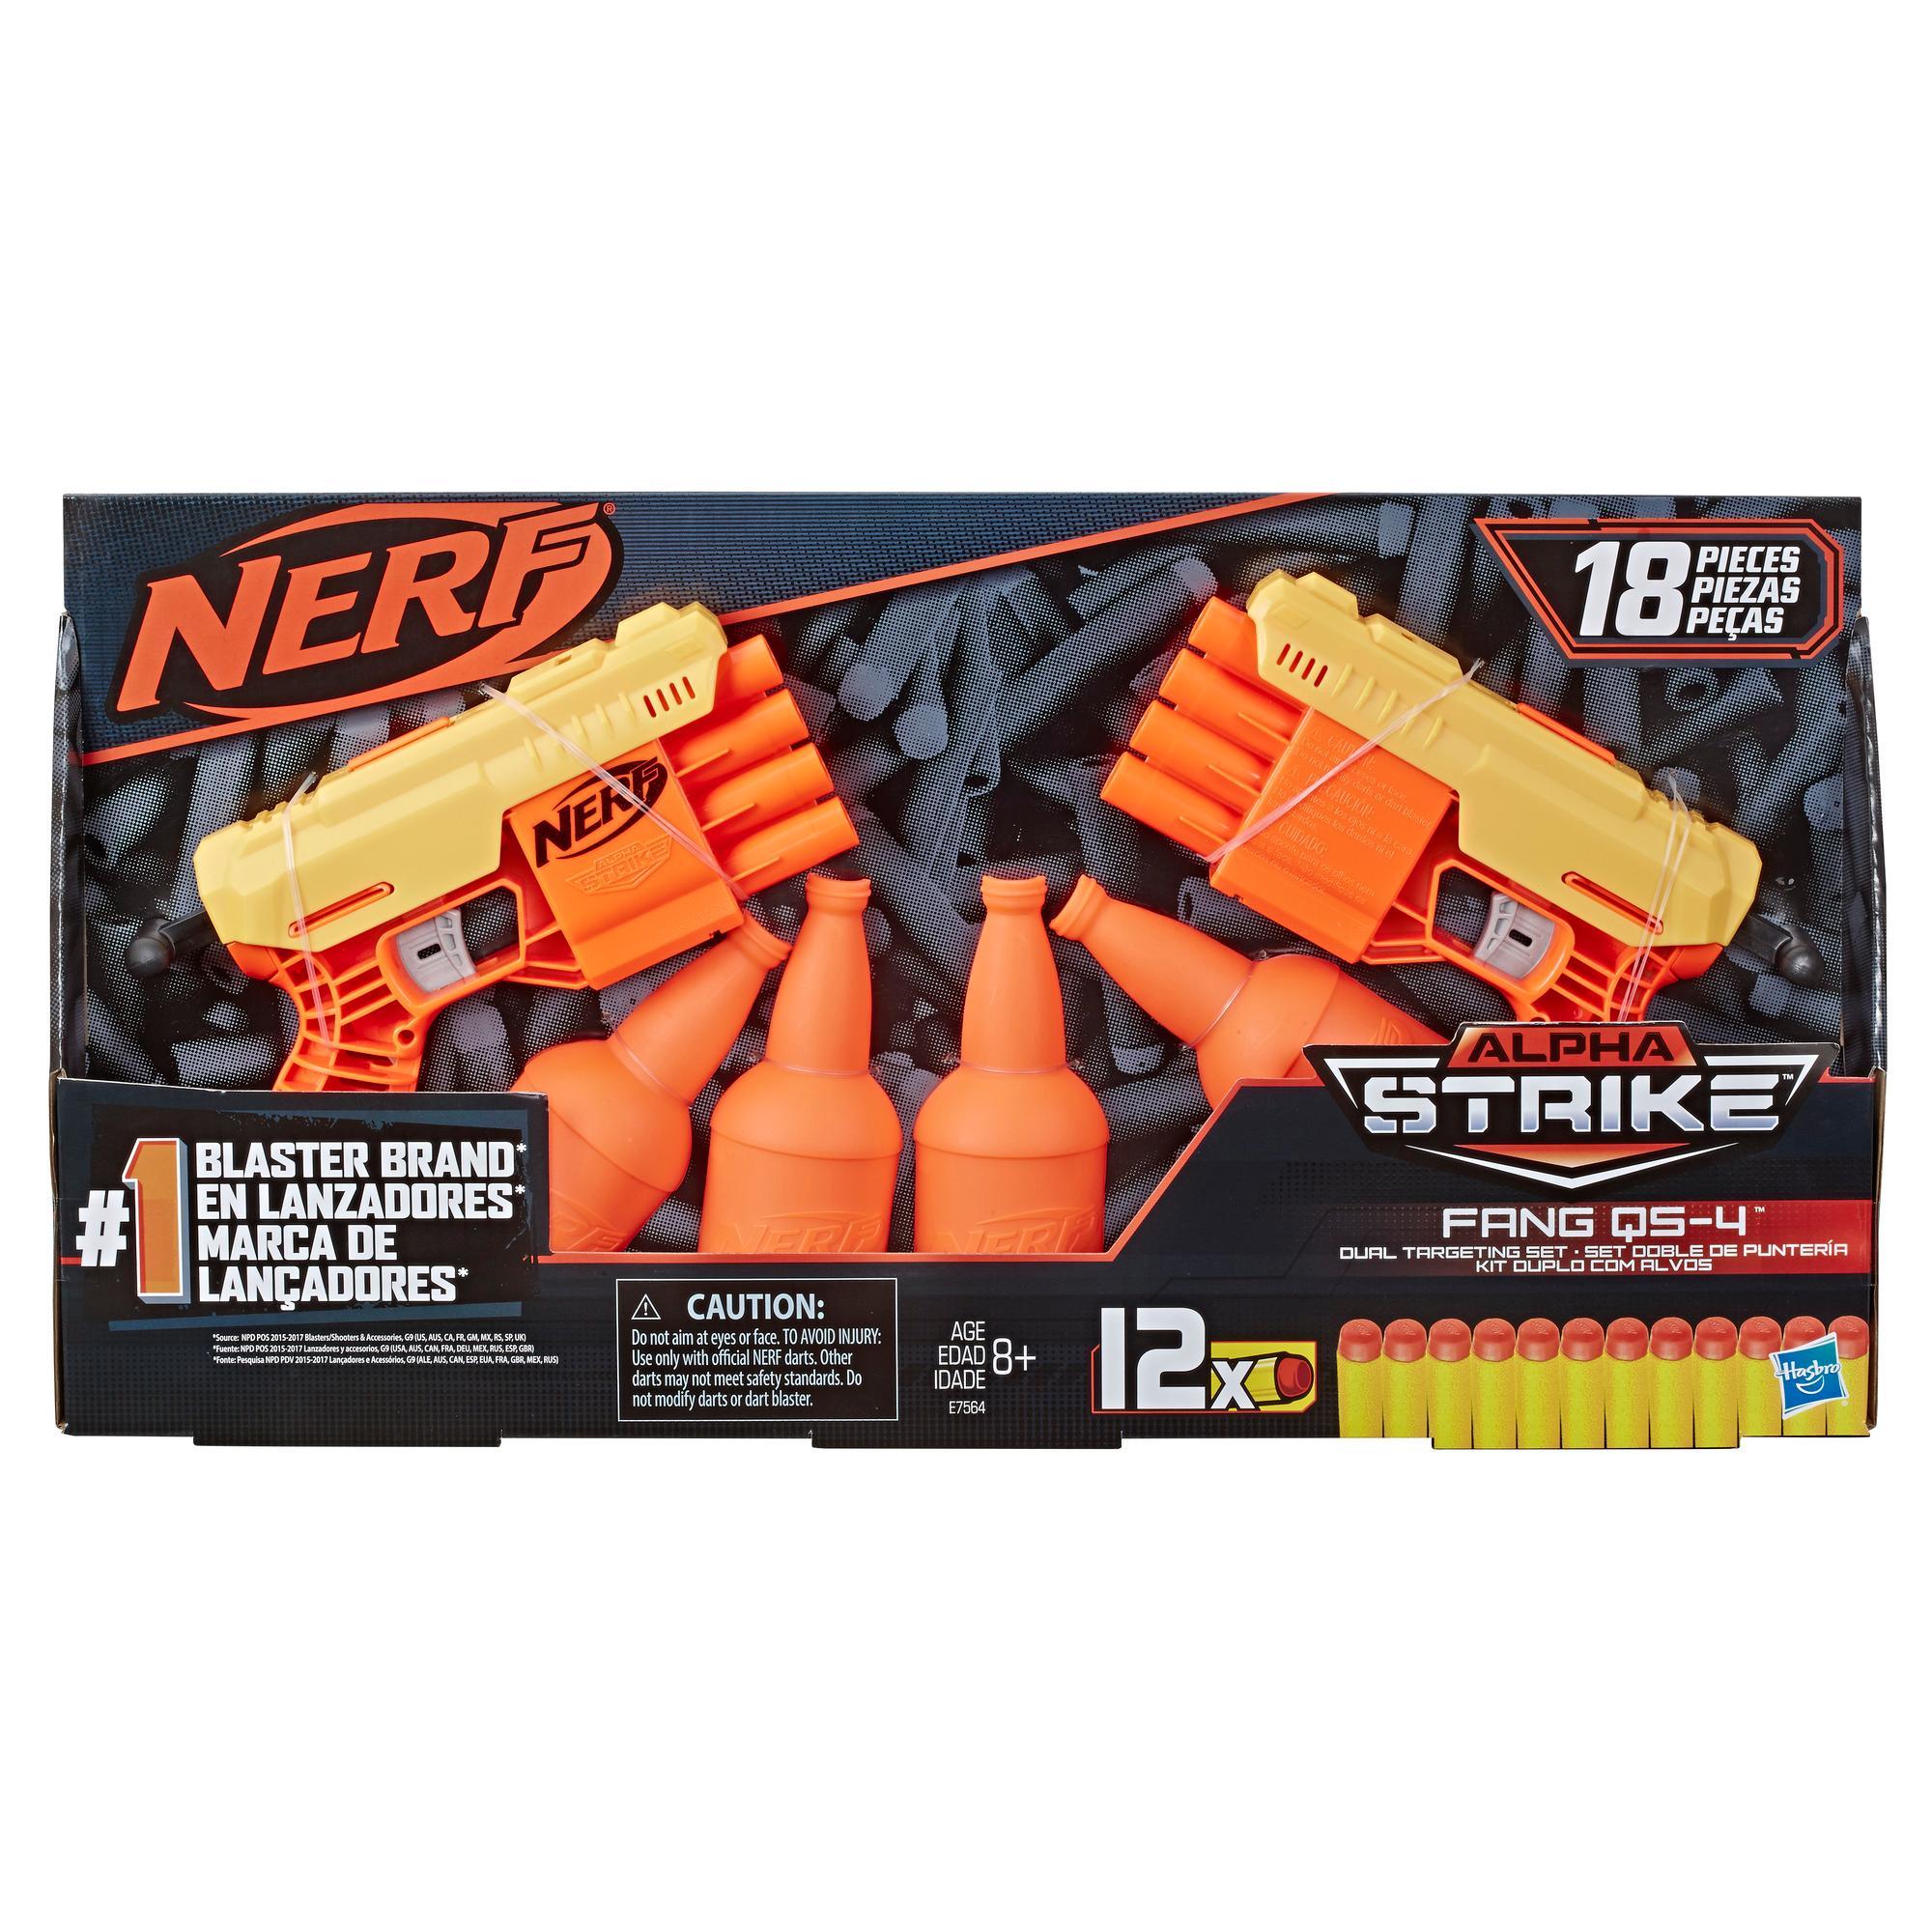 Kit Duplo de Treino Fang QS-4: O kit de 18 peças Nerf Alpha Strike